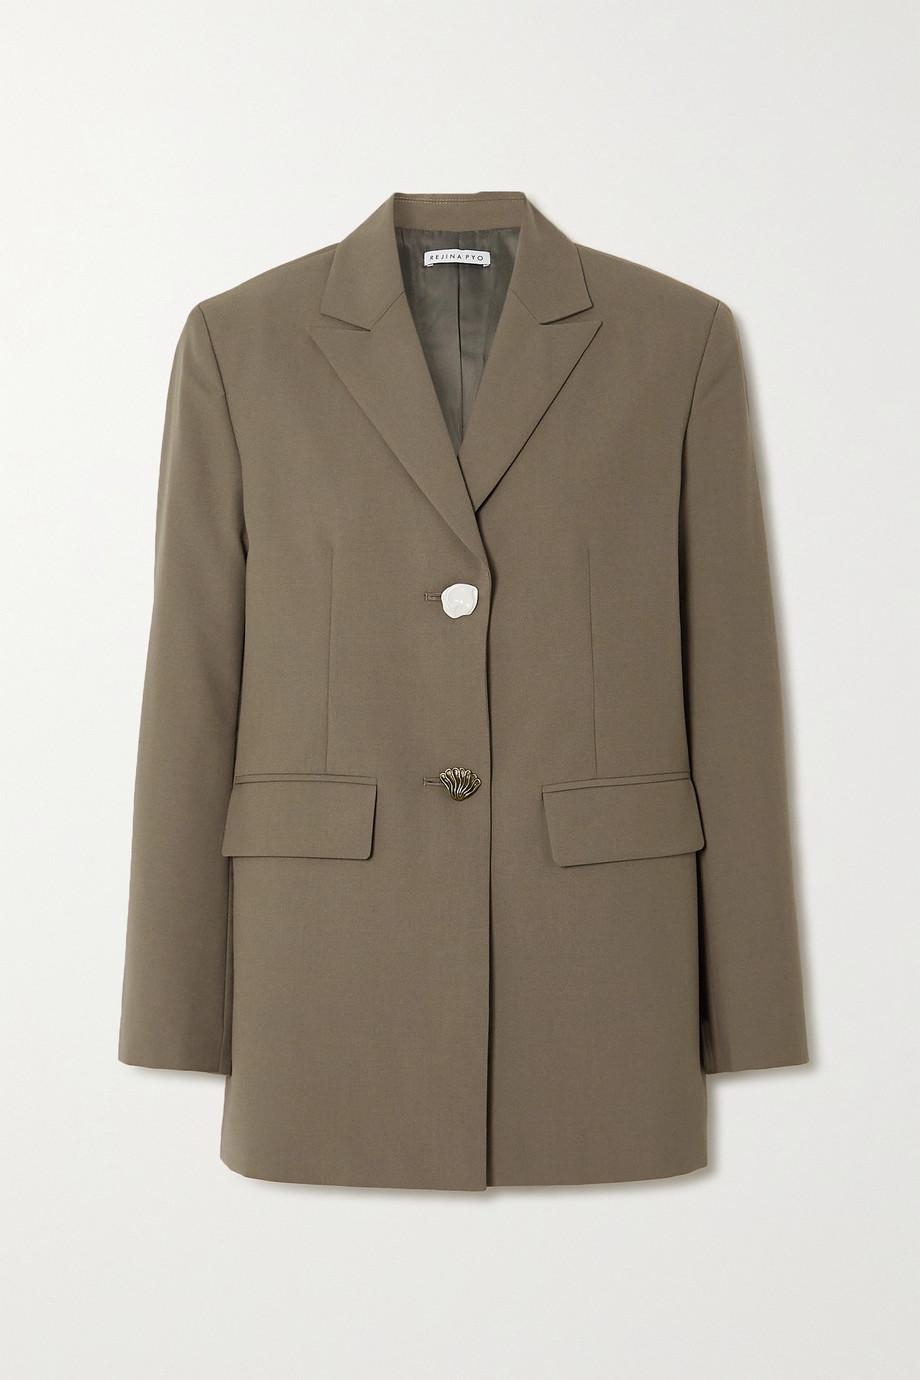 REJINA PYO Bowen 羊毛混纺西装外套